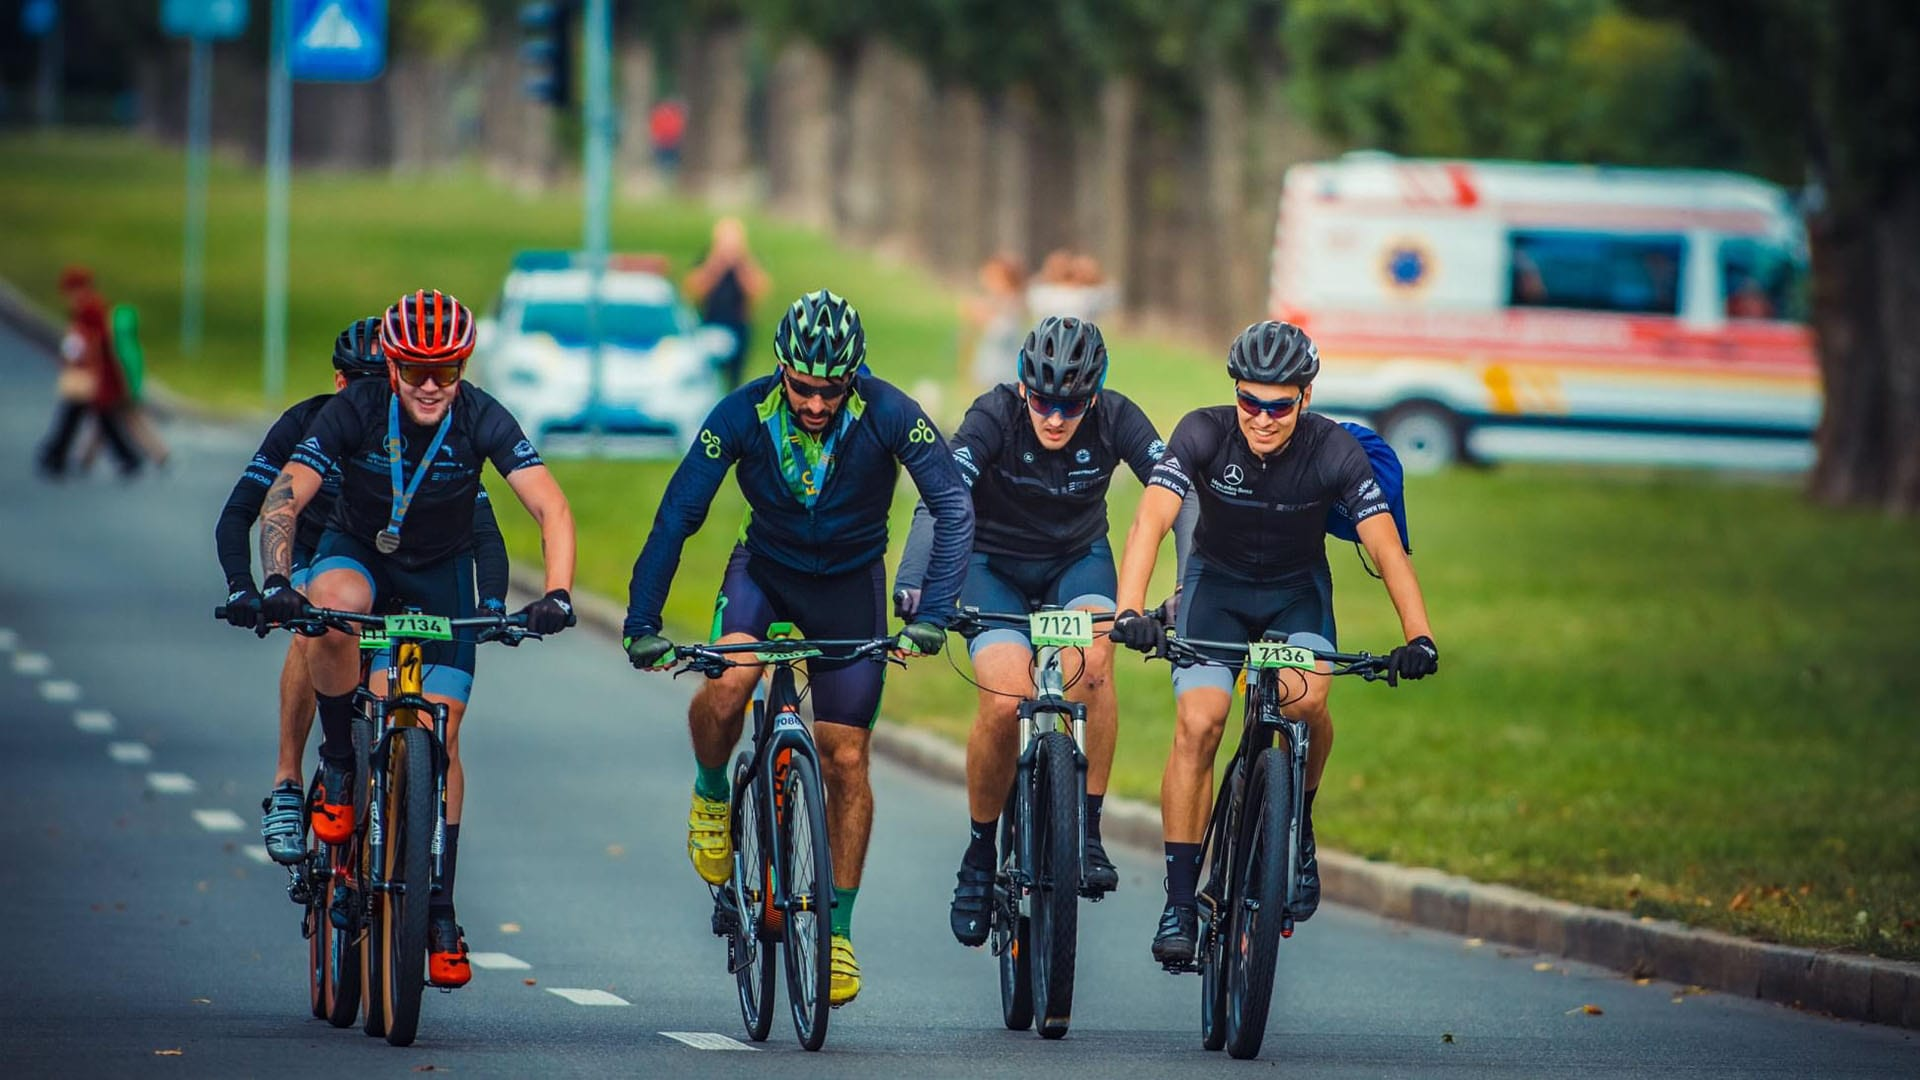 Результати веломарафону Київська сотка – команда Escape завоювала 4 золотих медалі